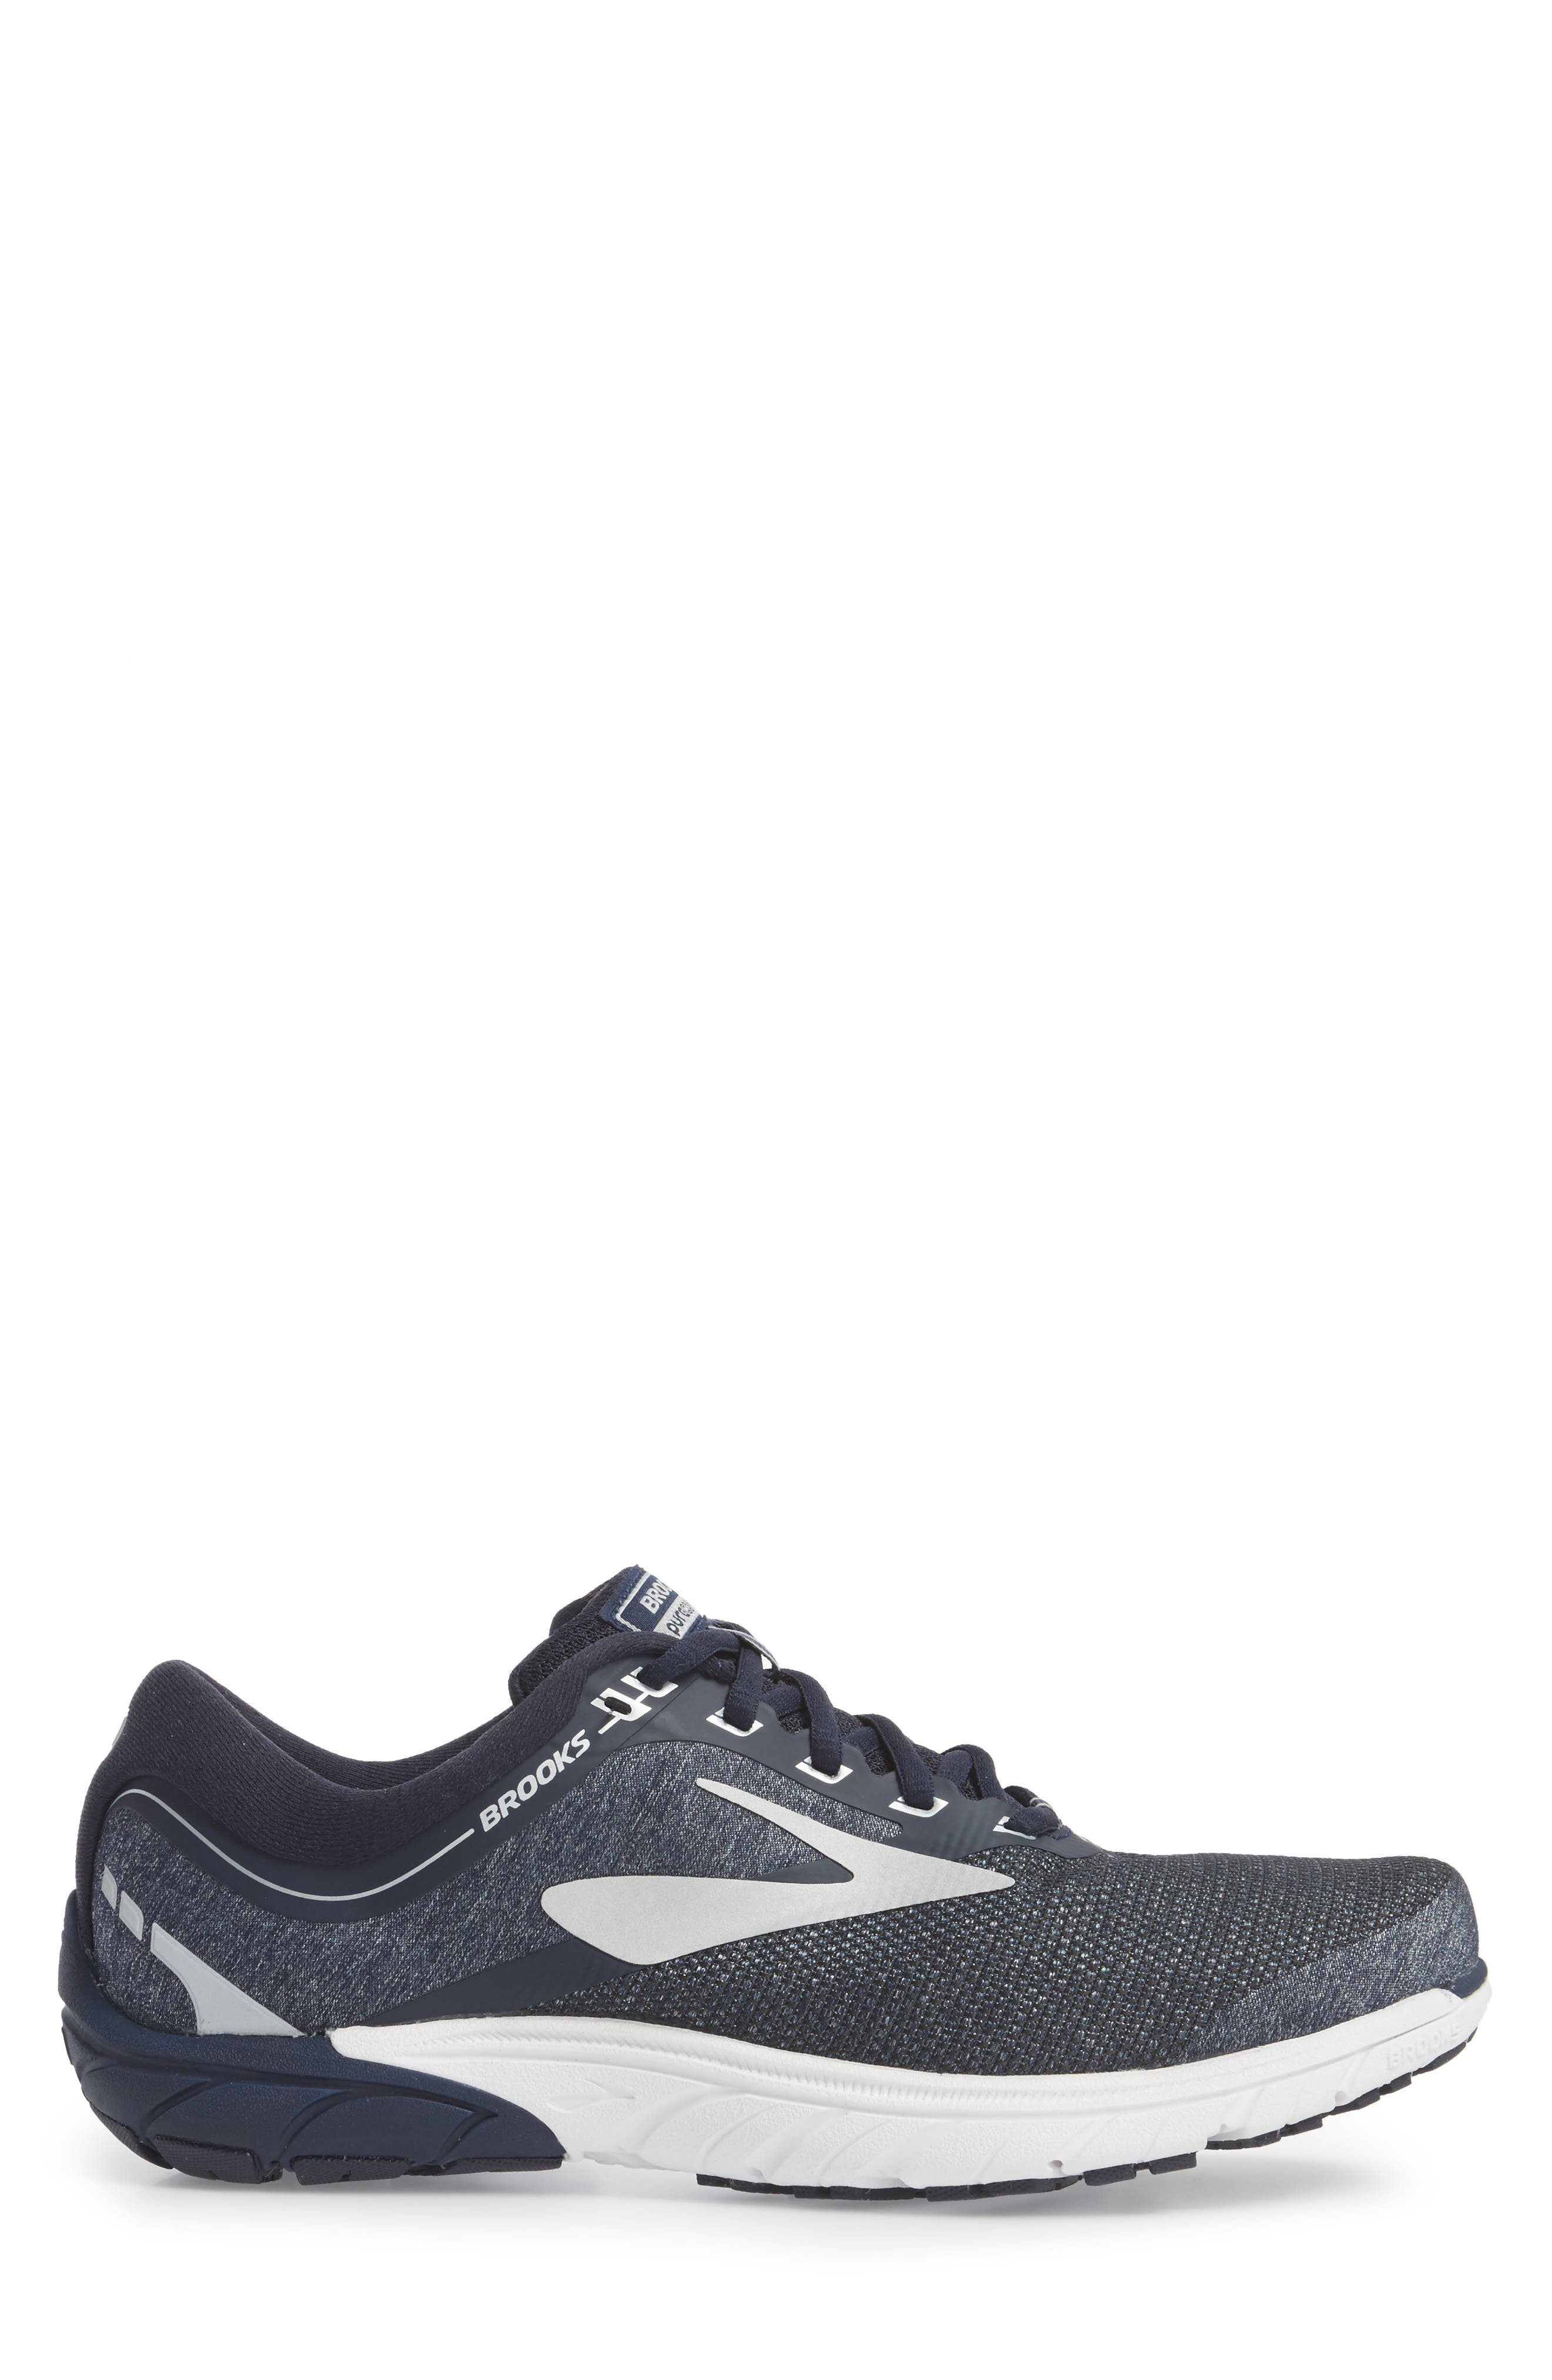 PureCadence 7 Road Running Shoe,                             Alternate thumbnail 3, color,                             Peacoat/ Silver/ White